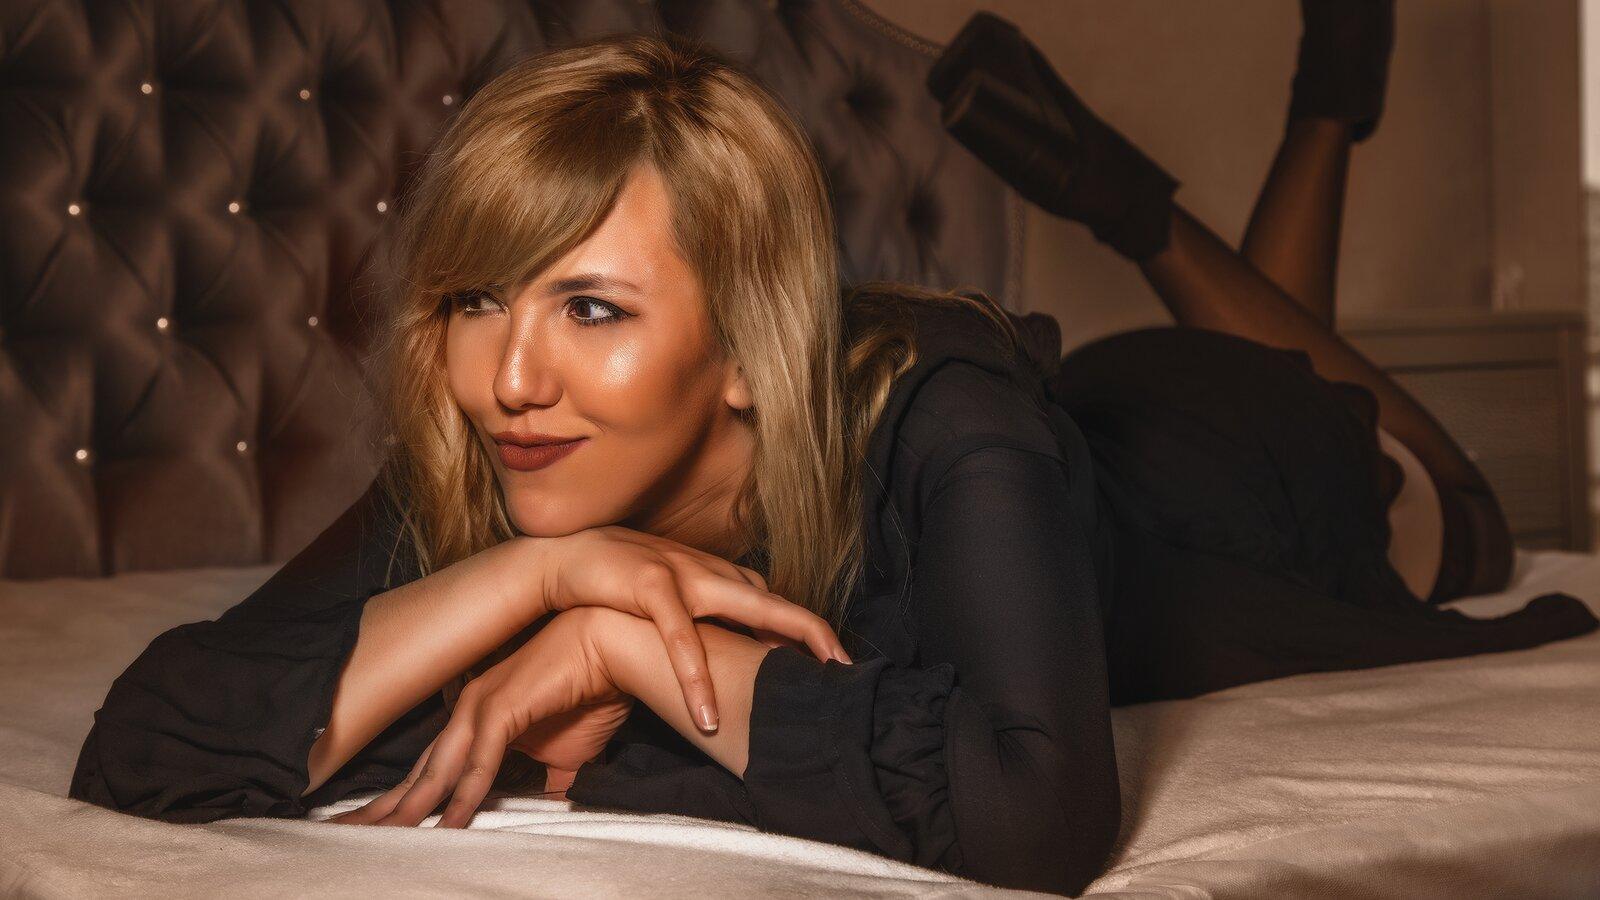 IsabellDiva